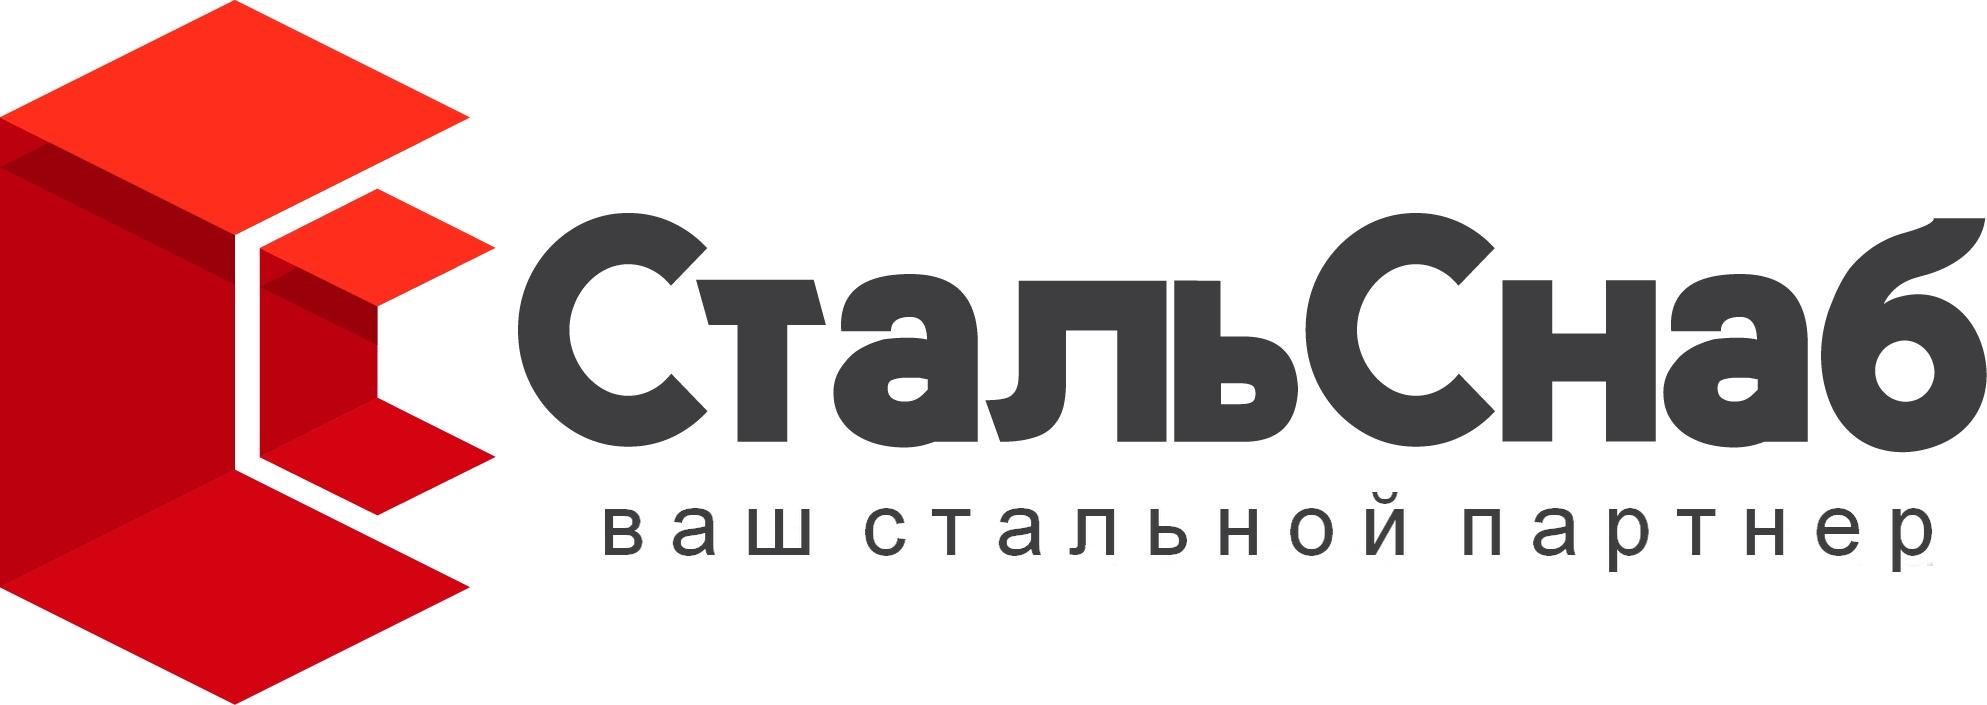 Стальснаб дизайн лида сайт